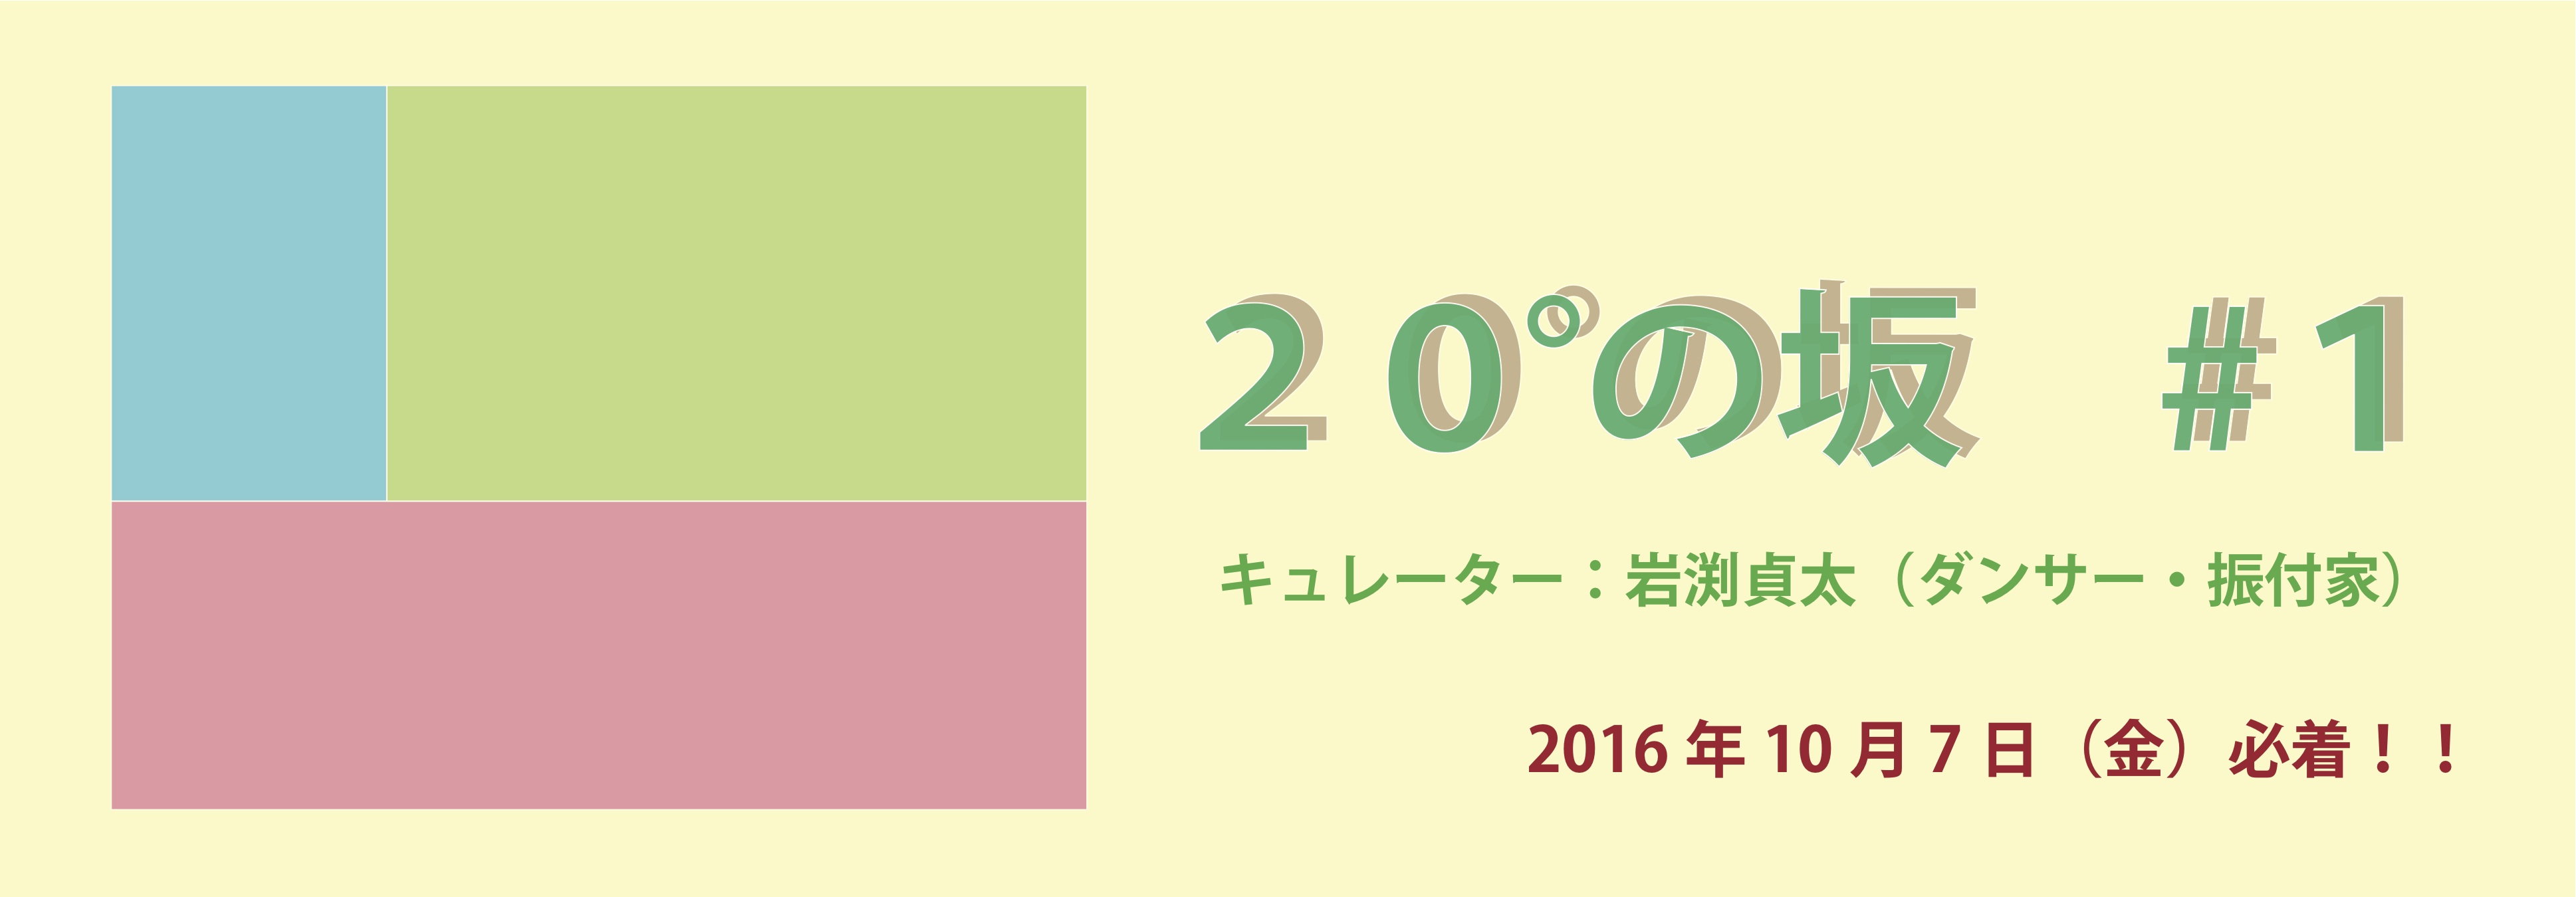 20%e3%81%ae%e5%9d%82%e3%83%92%e3%82%9a%e3%83%83%e3%82%af%e3%82%a2%e3%83%83%e3%83%95%e3%82%9a